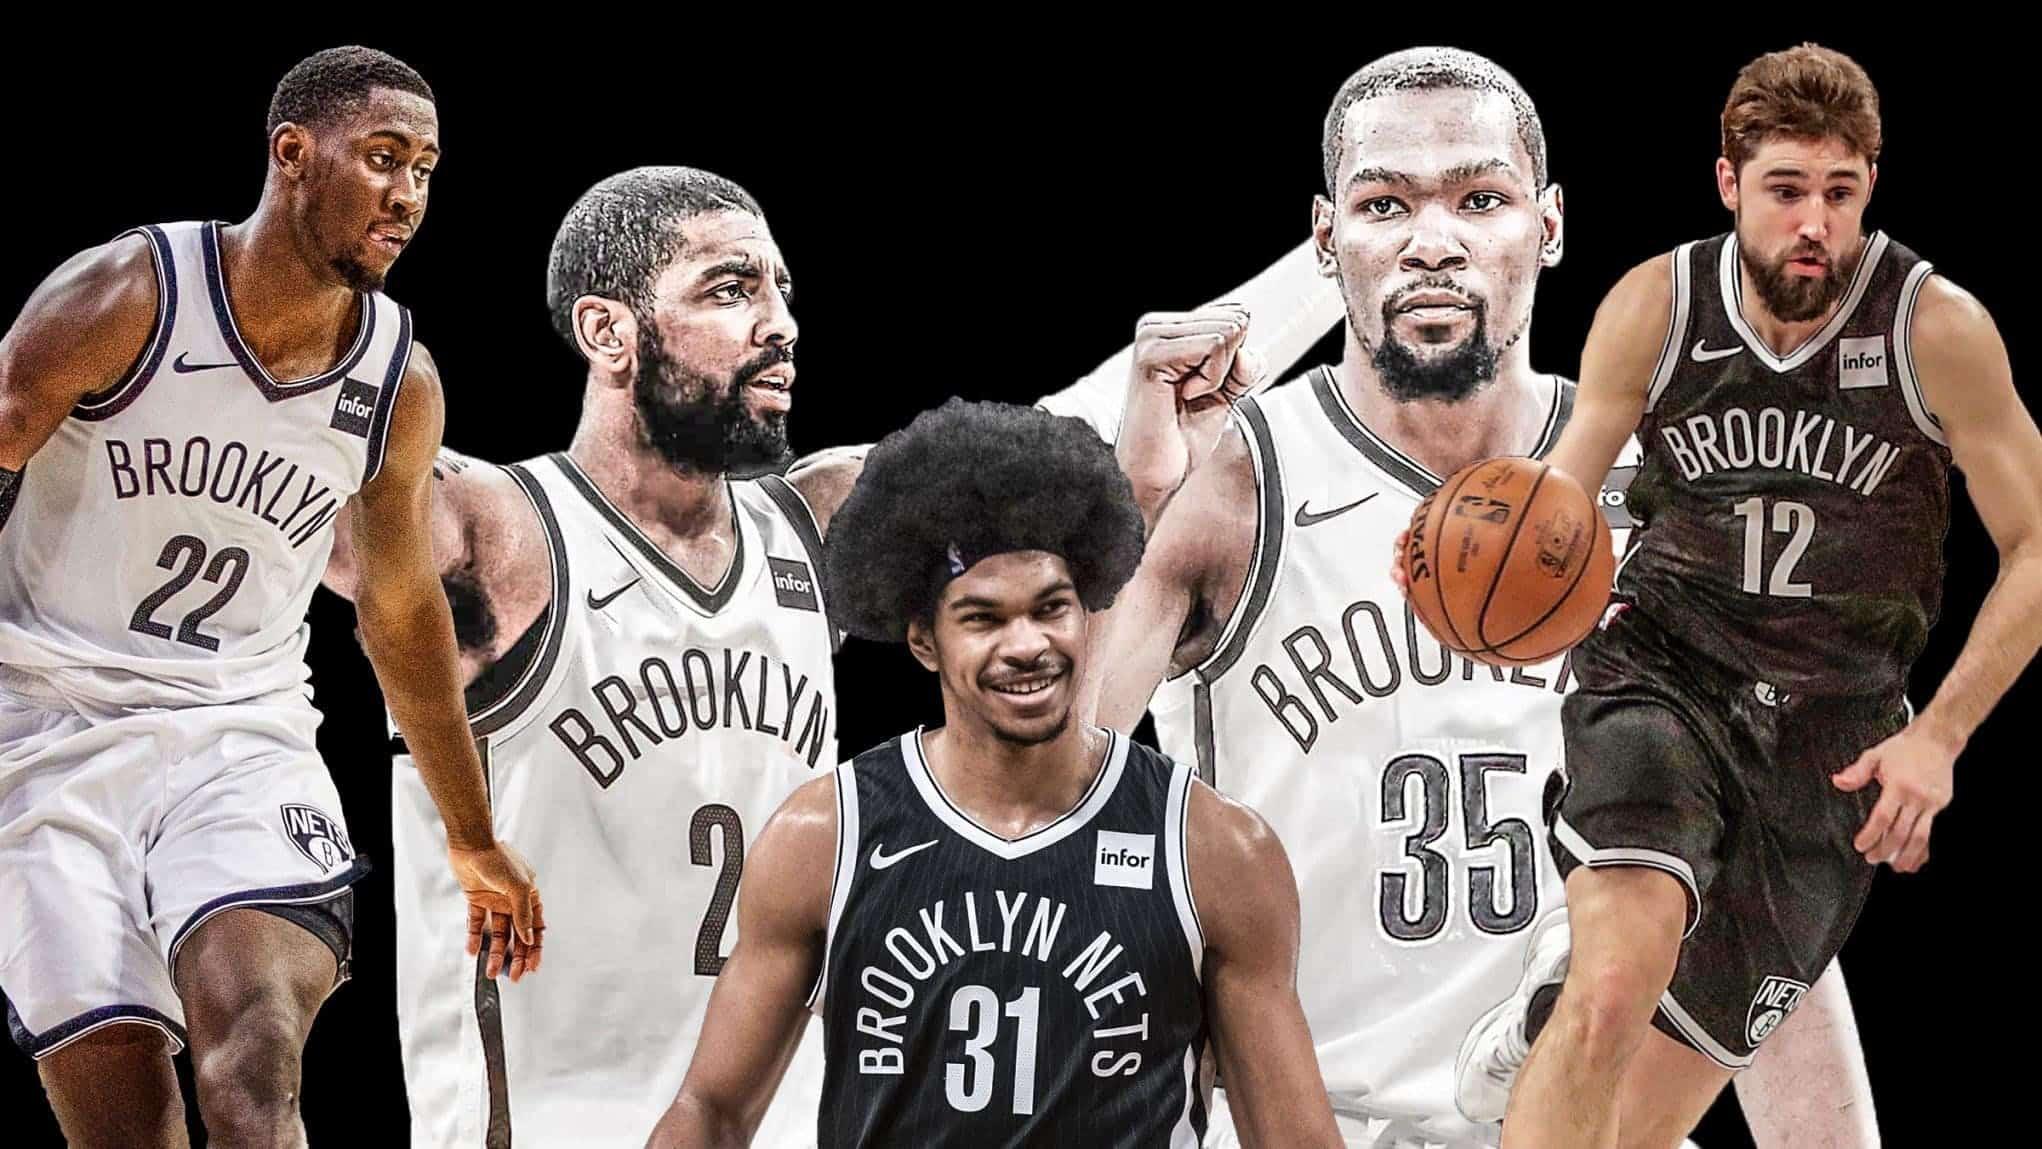 Nba preview - Brooklyn Nets 2020